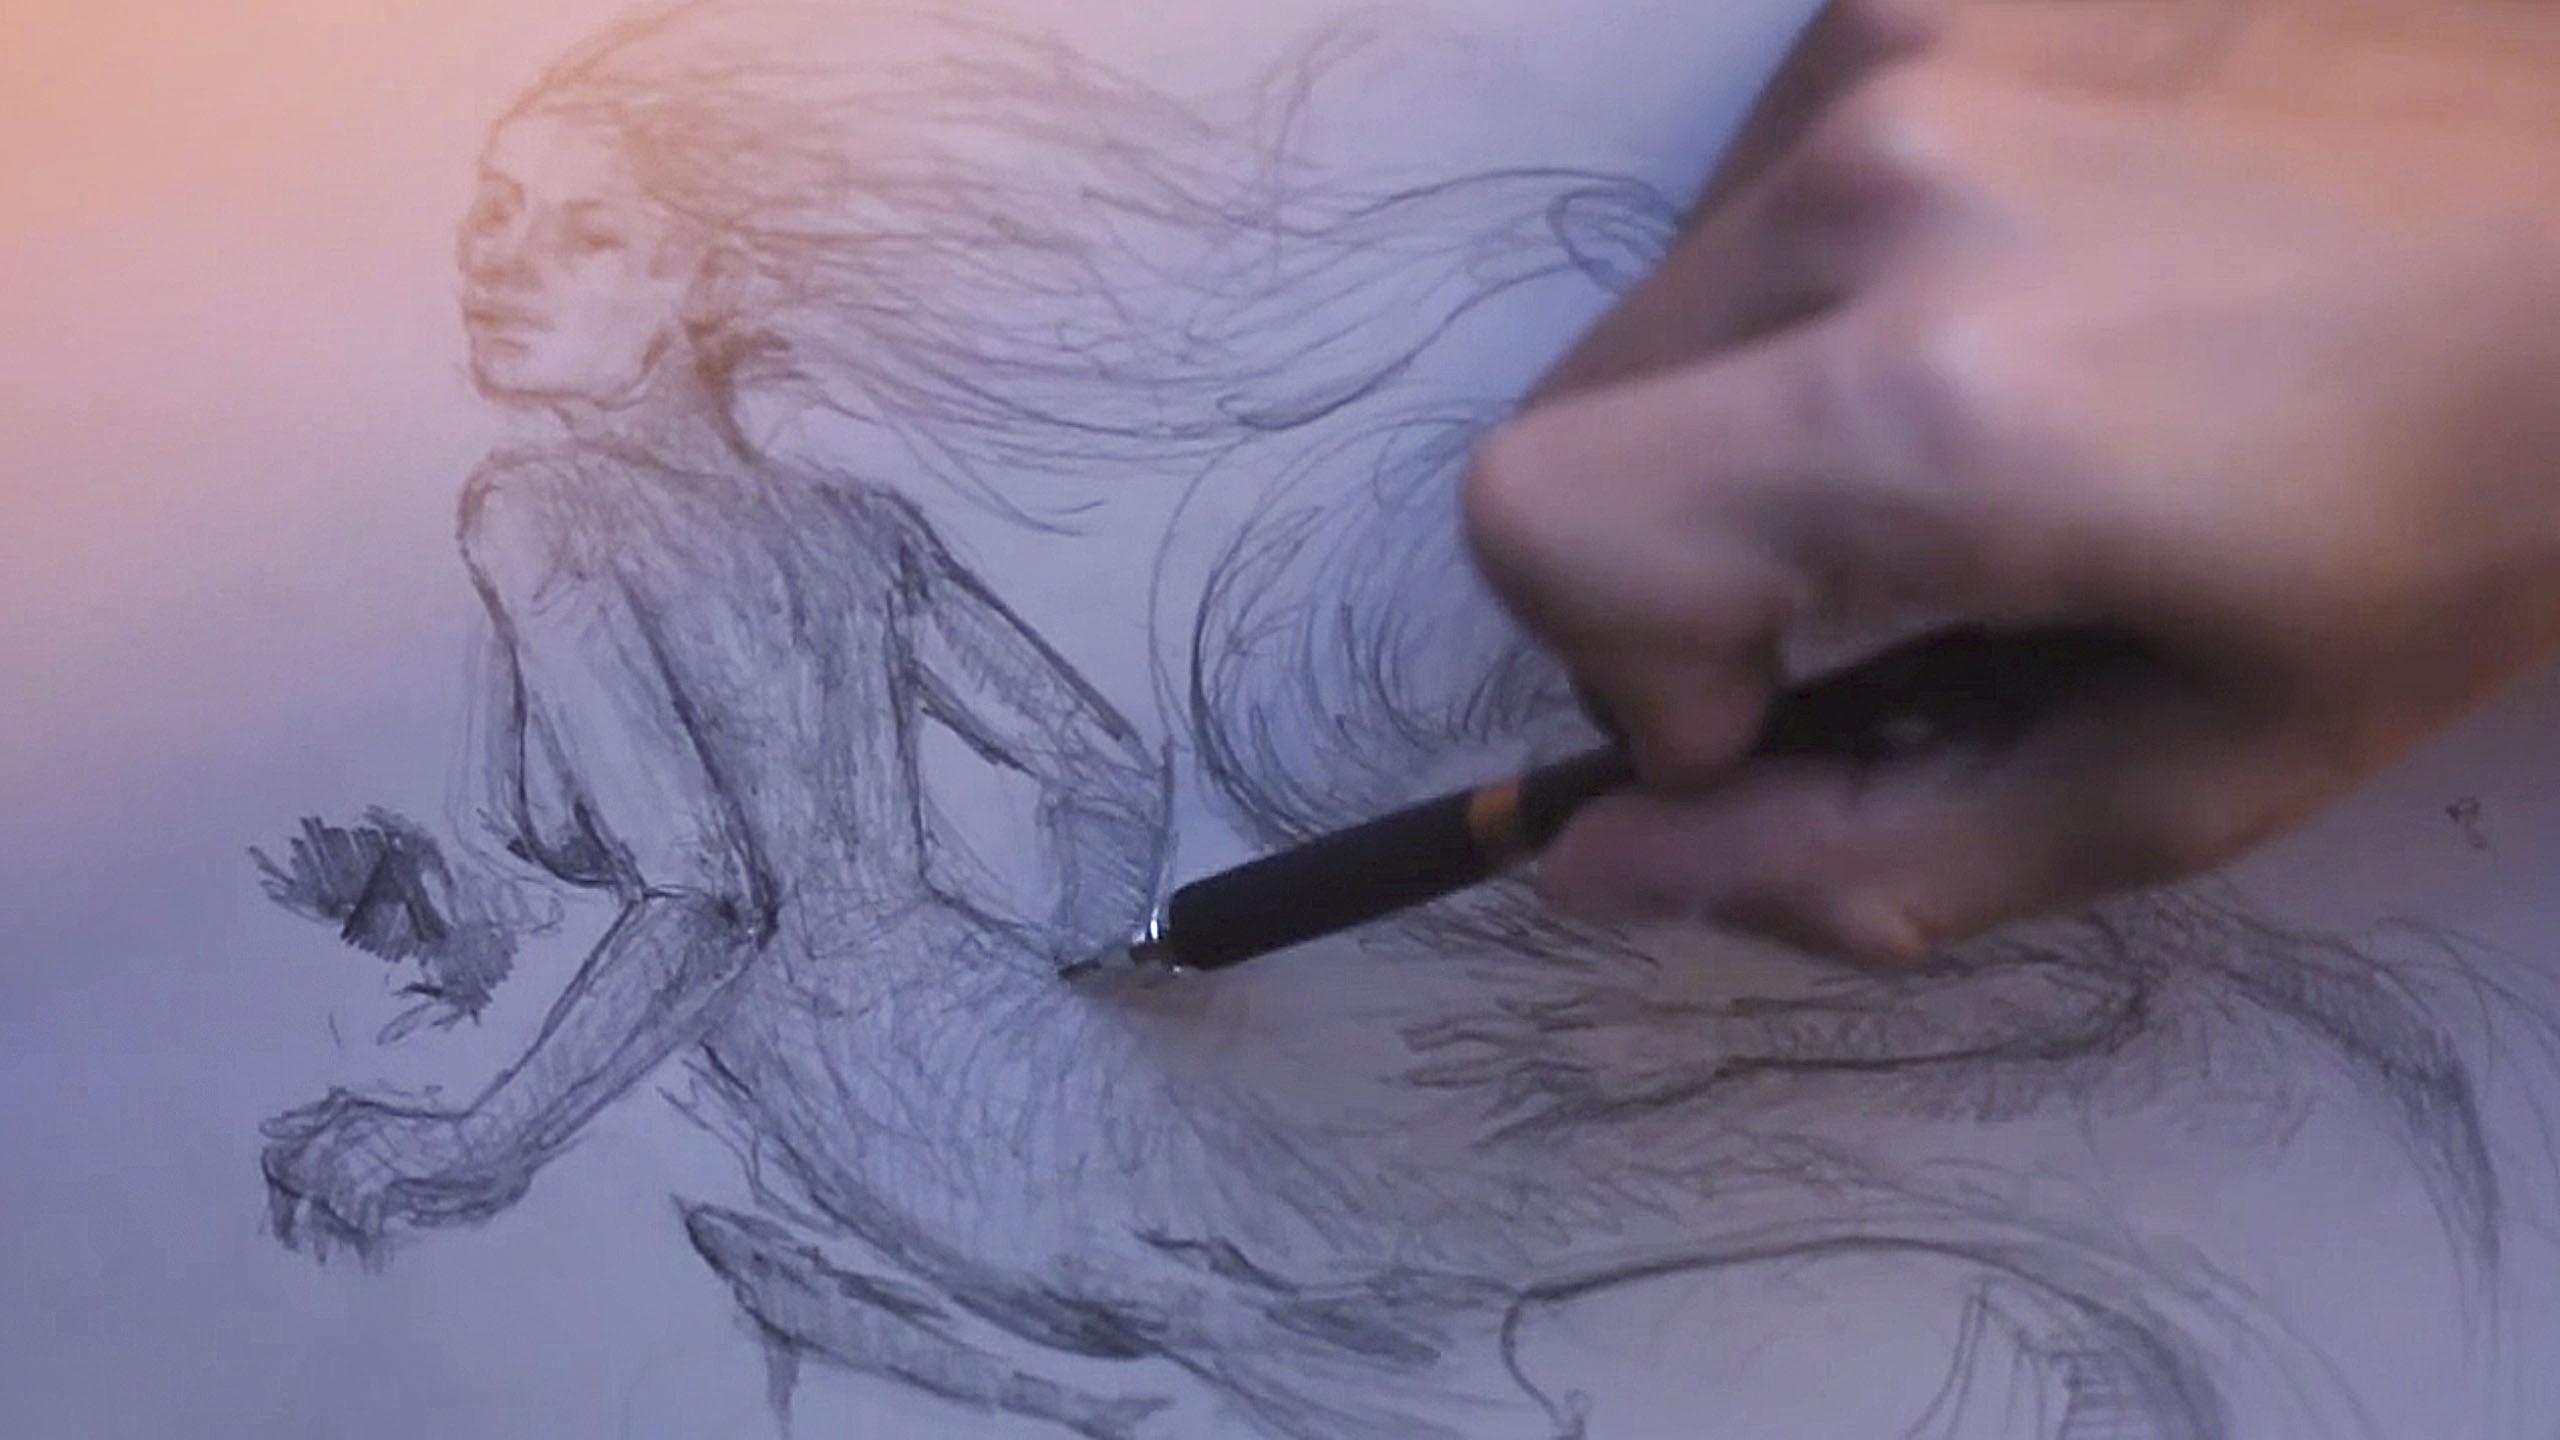 1_Retouching_Academy_LightFarmStudios_Mermaids_sketch_3